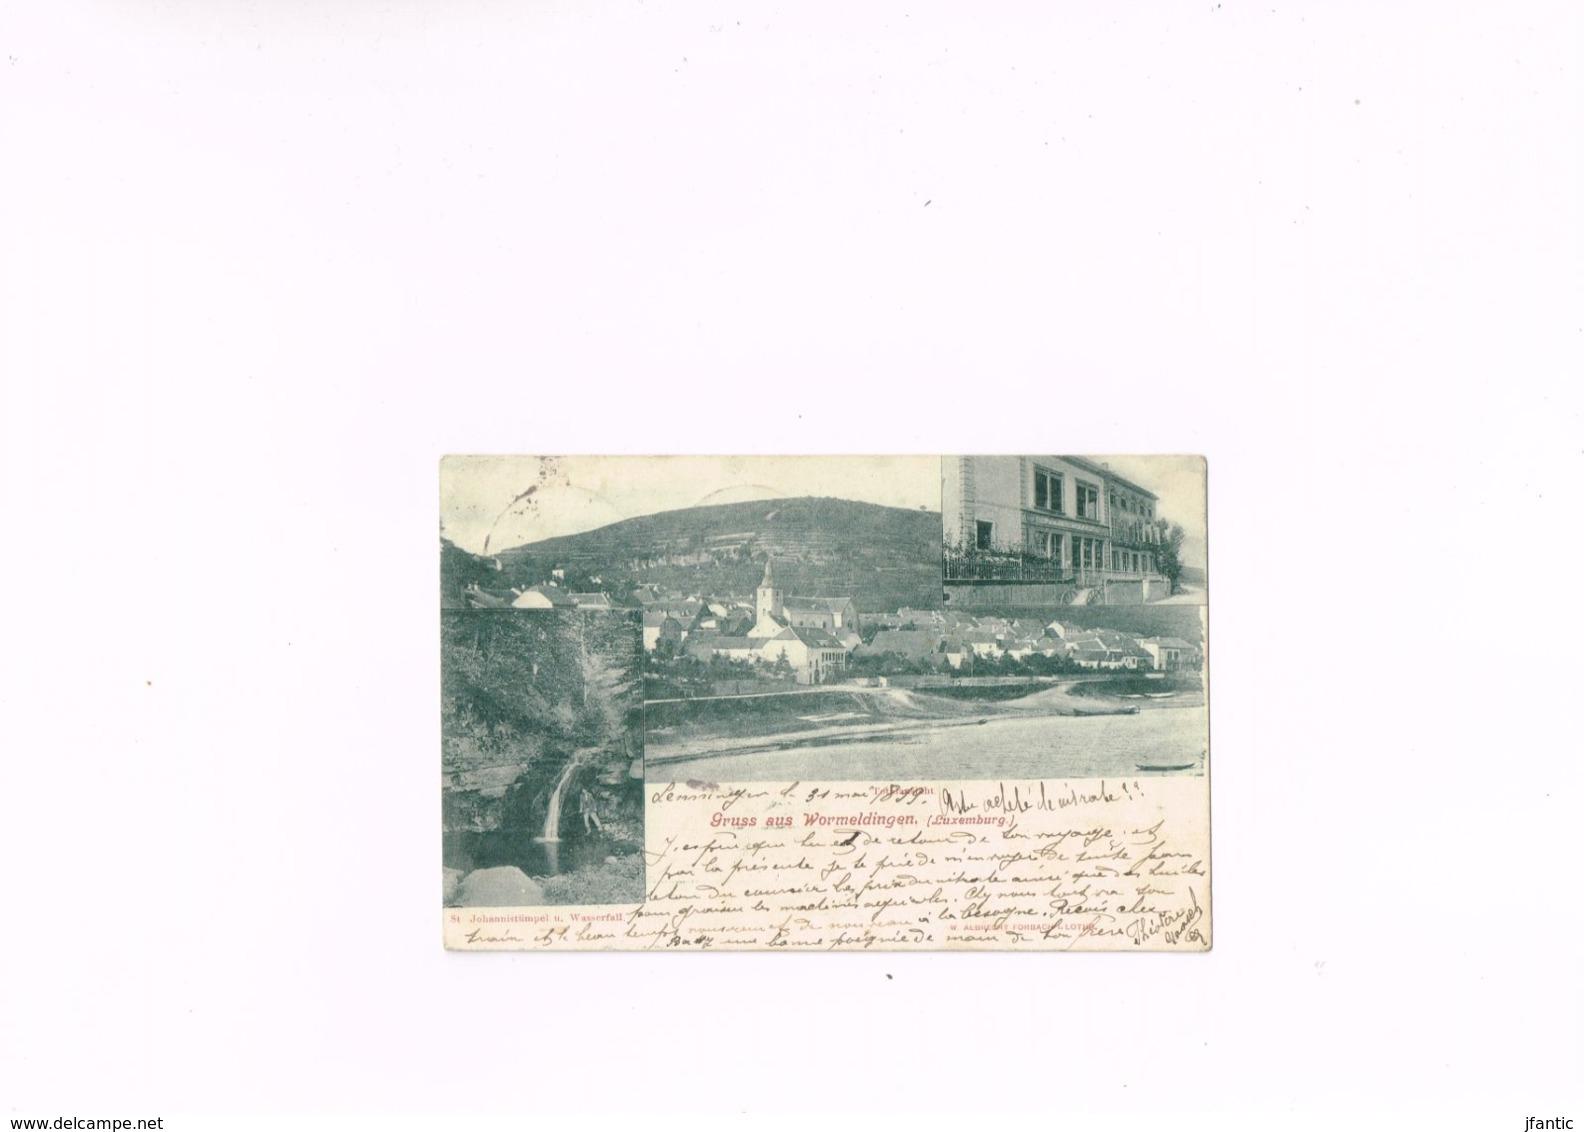 Gruss Aus Wormeldingen Luxemburg W Albrecht Forbach I.lothr, Carte Postale Ancienne 1899. - Cartes Postales